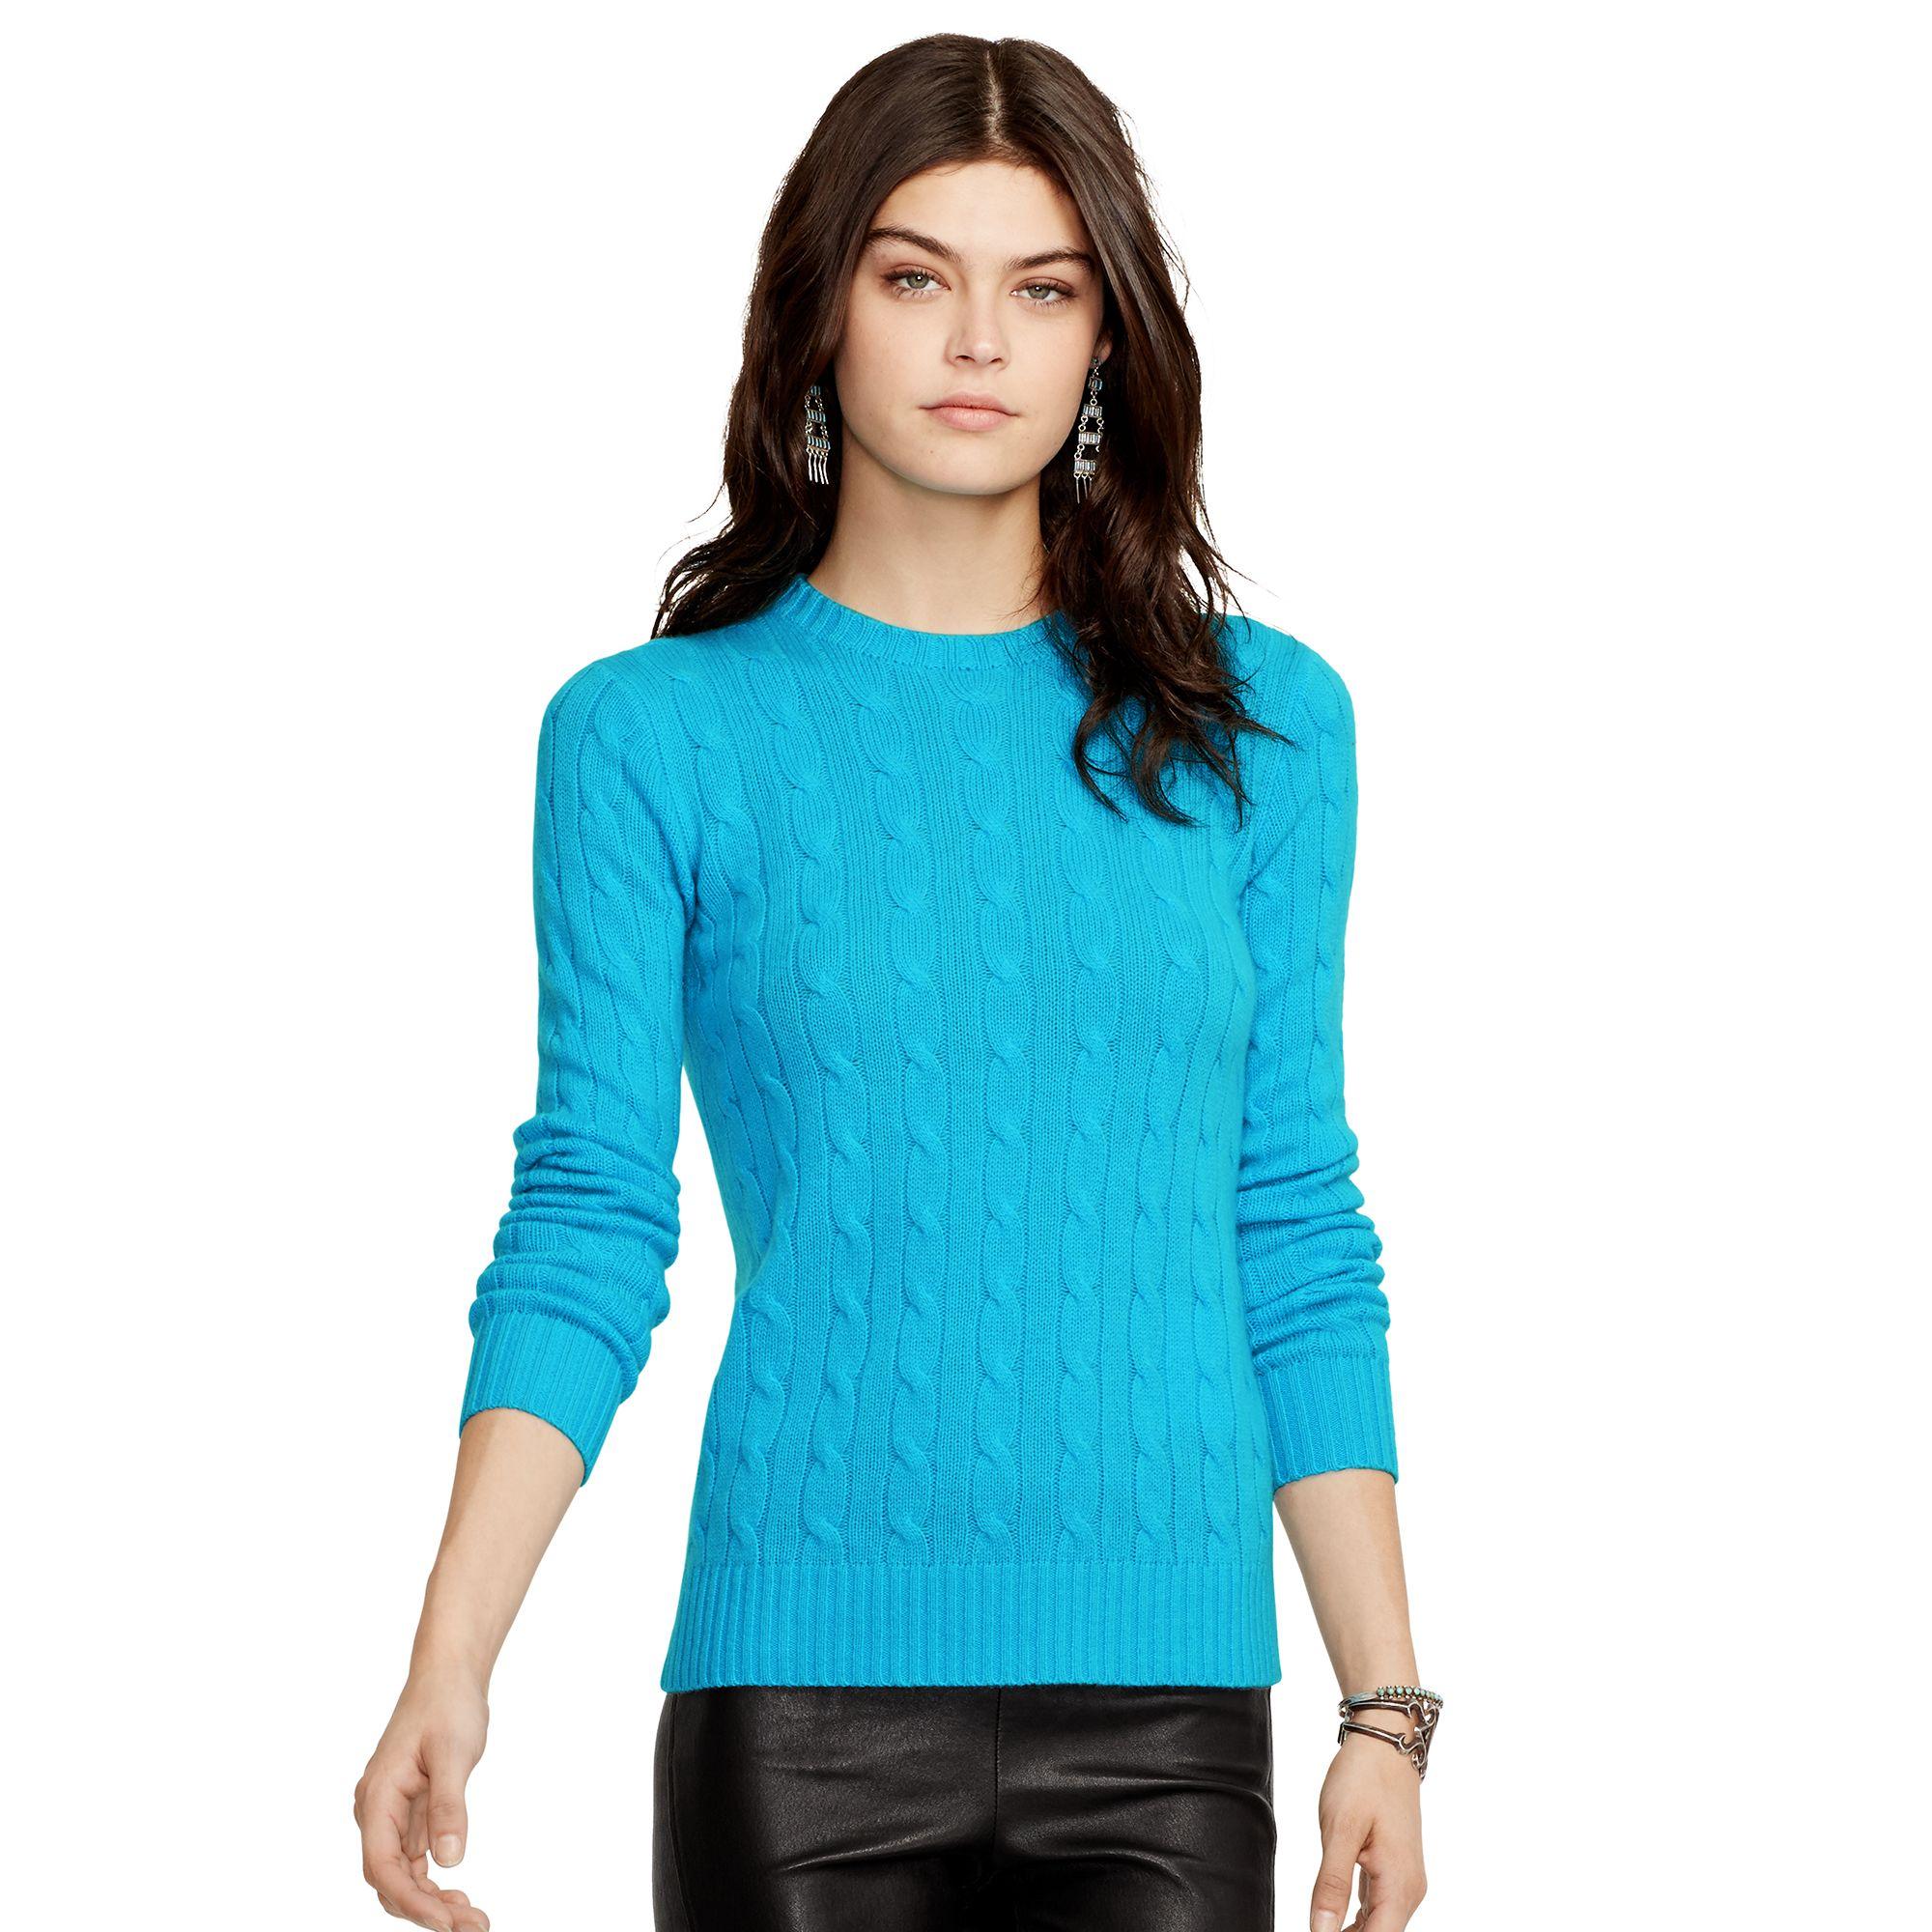 polo ralph lauren slim fit cabled cashmere in blue liquid. Black Bedroom Furniture Sets. Home Design Ideas